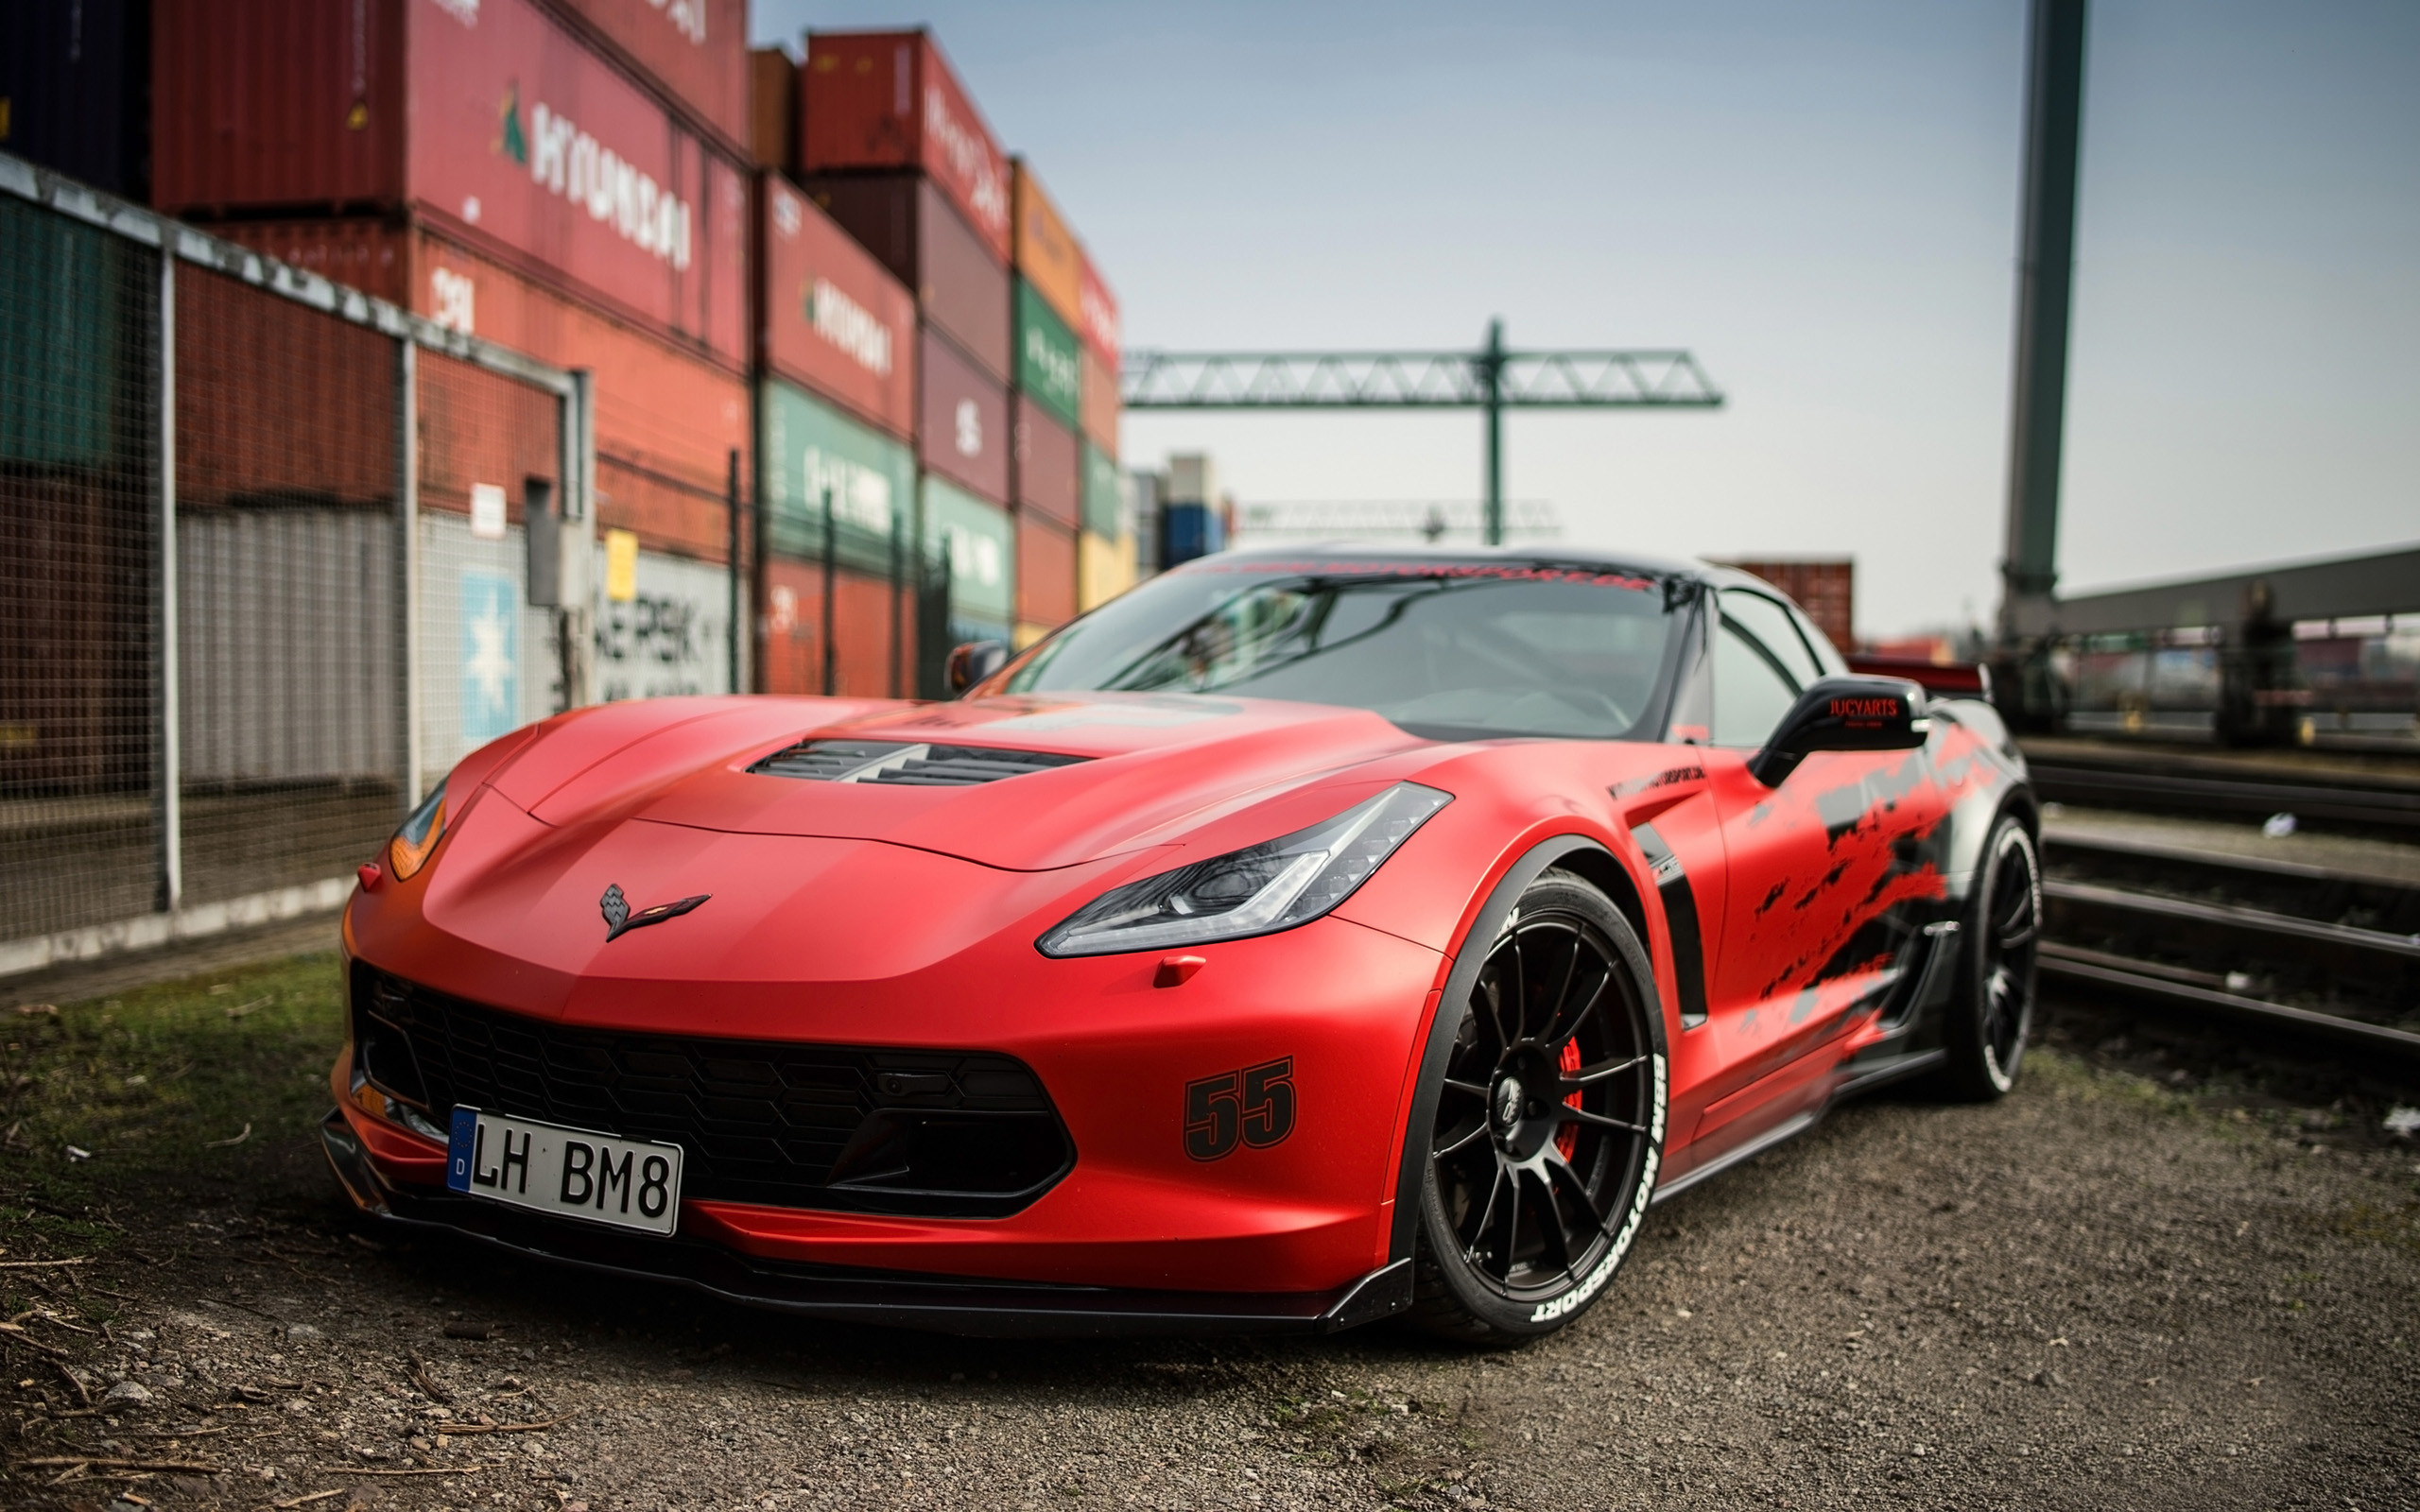 C7 Corvette Wallpaper 76 images